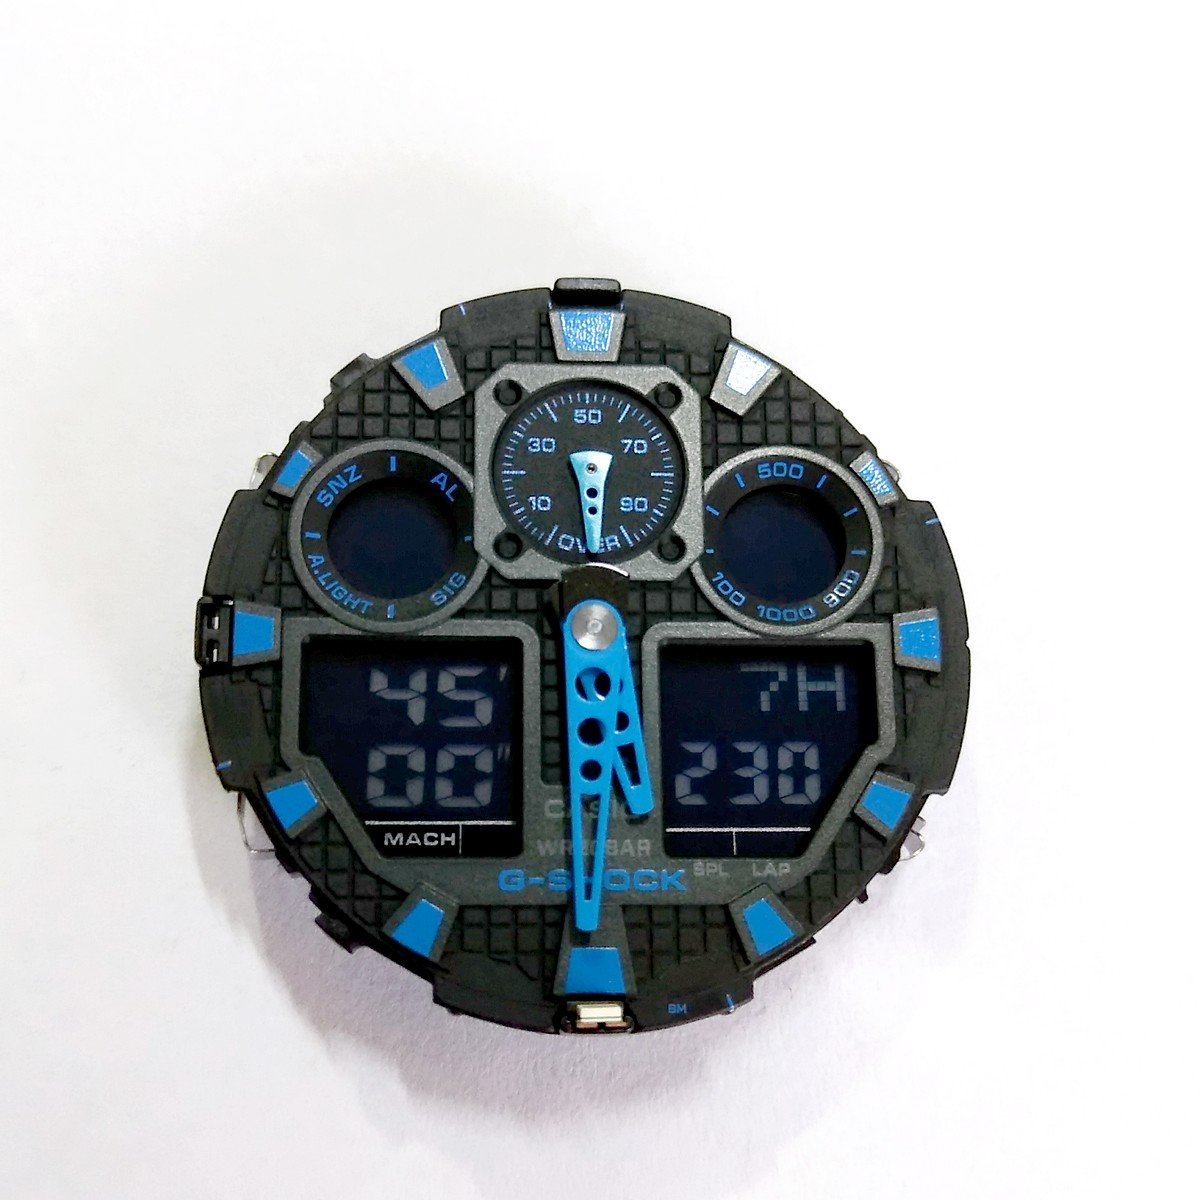 Módulo Circuito Interno Casio G-shock  GA-100-1A2, GA-100L-2A, GA-100CB-1a  - E-Presentes